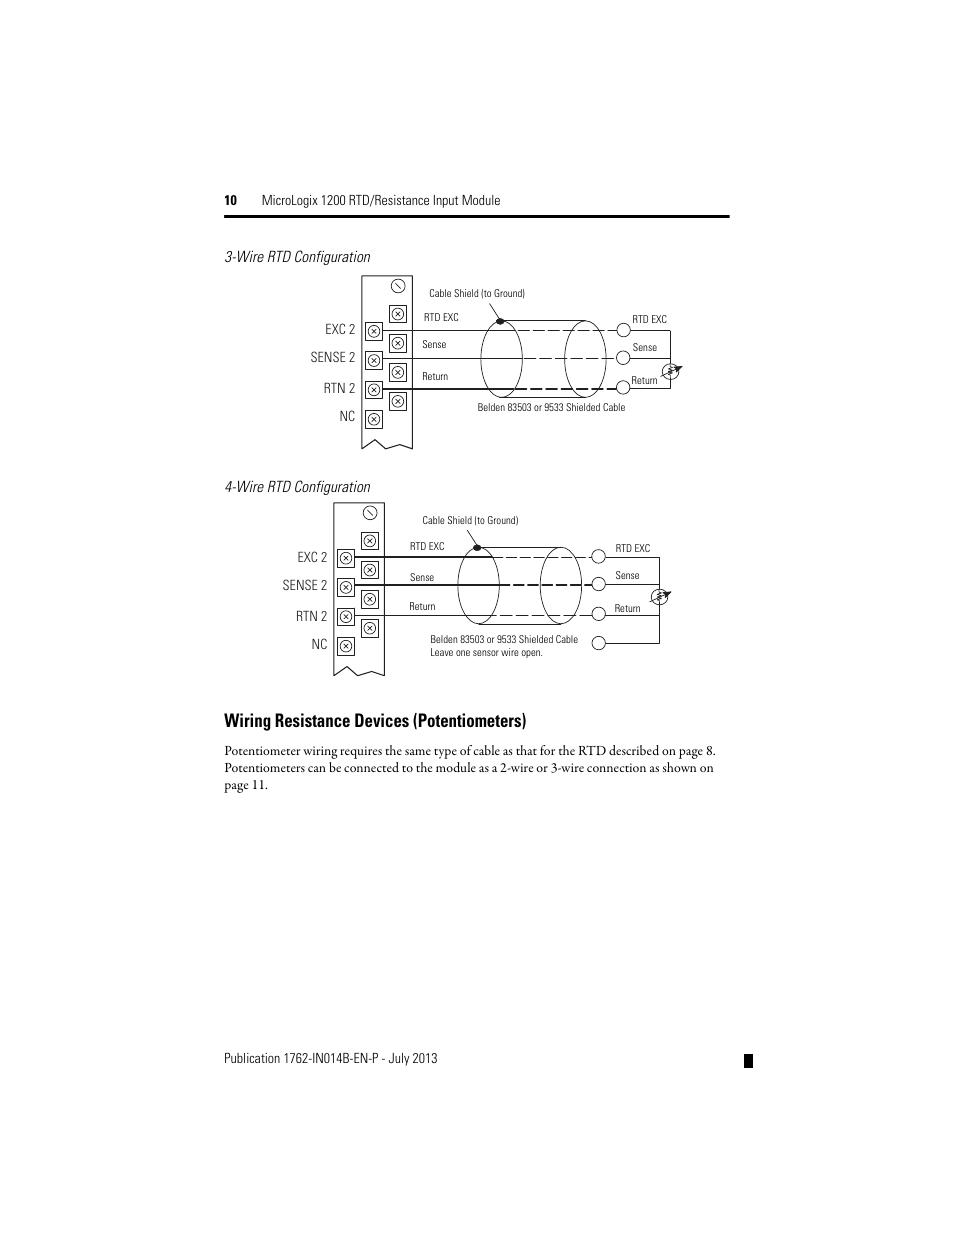 allen bradley micrologix 1400 user manual